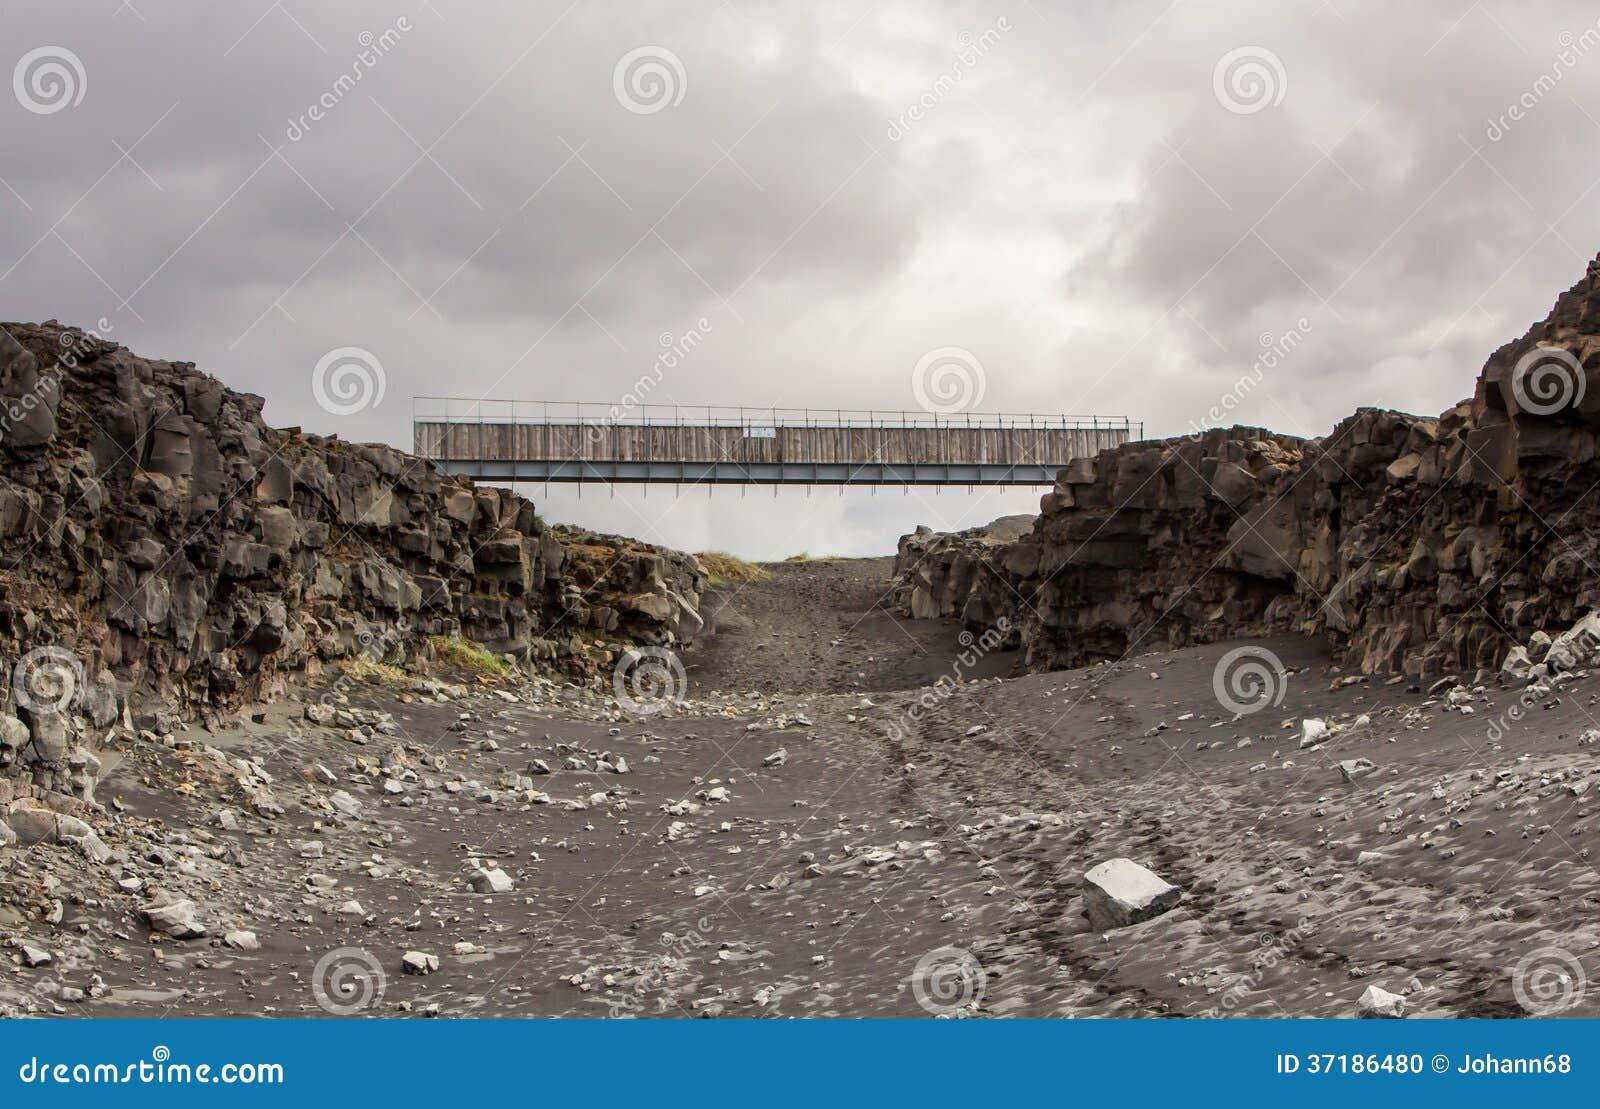 Bridge Between Continents, Iceland Stock Photo - Image ...